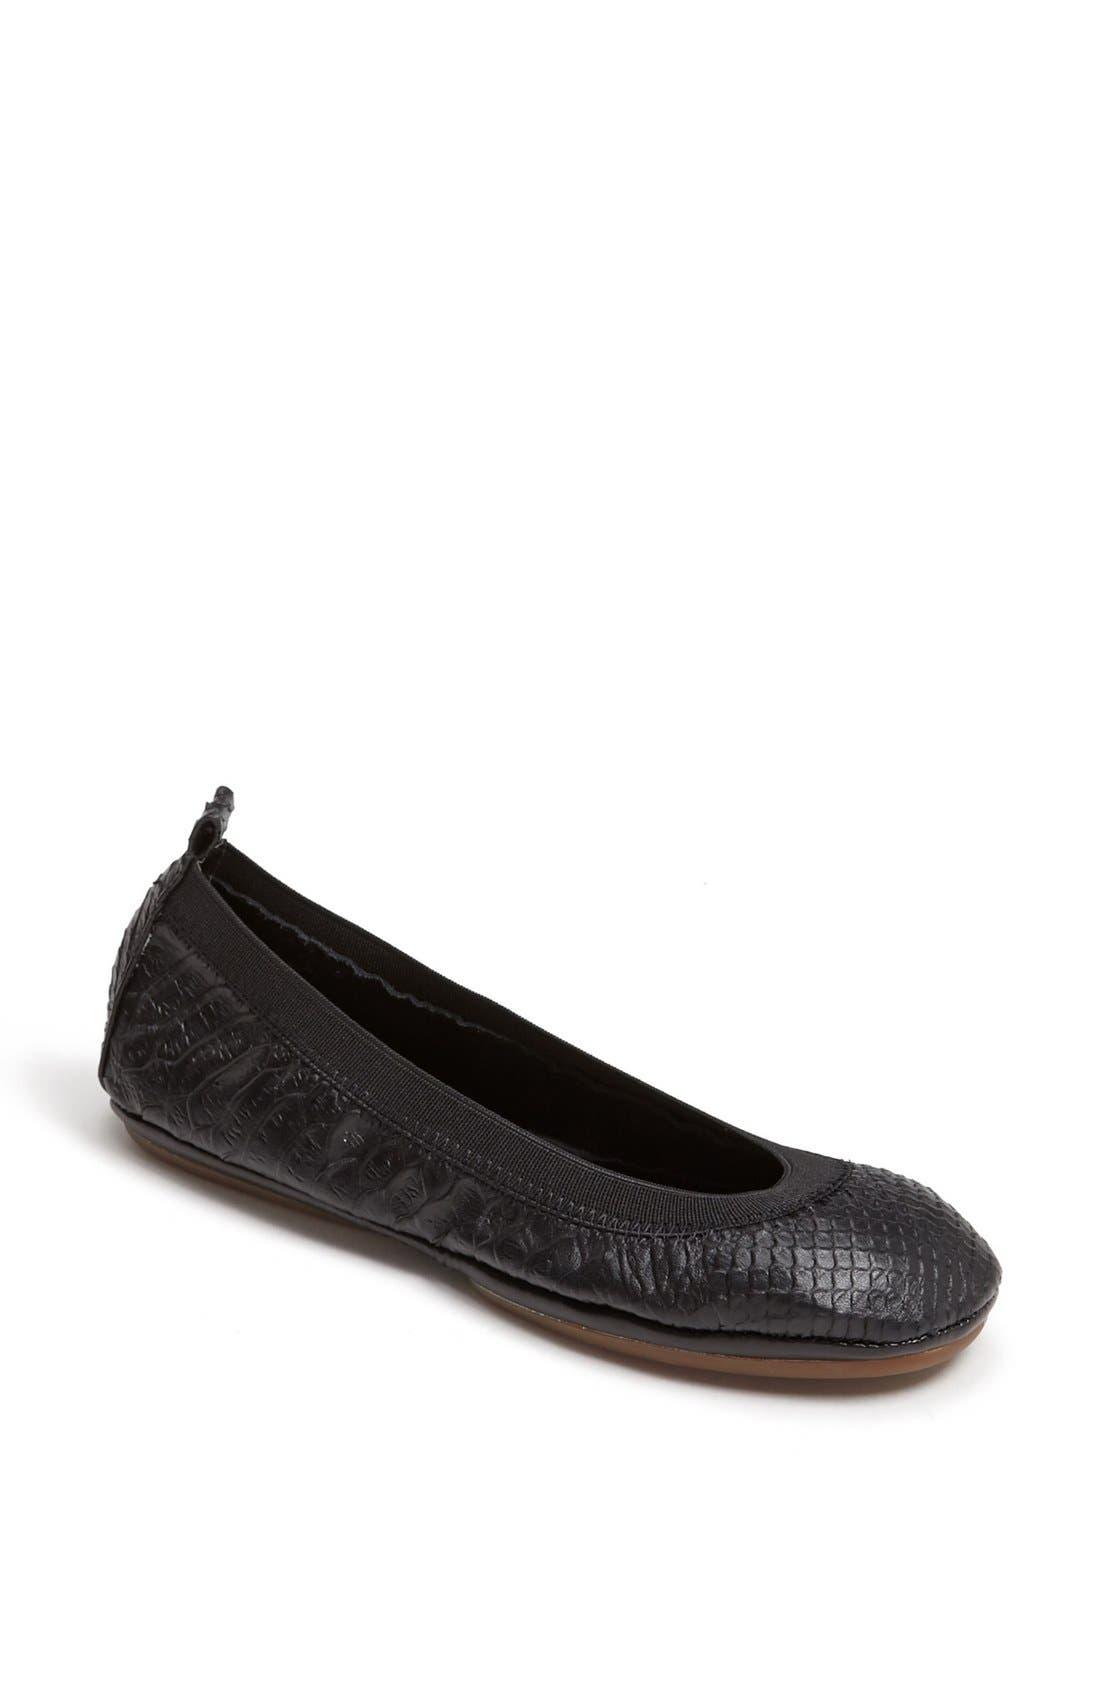 Alternate Image 1 Selected - Yosi Samra Croc Embossed Foldable Ballet Flat